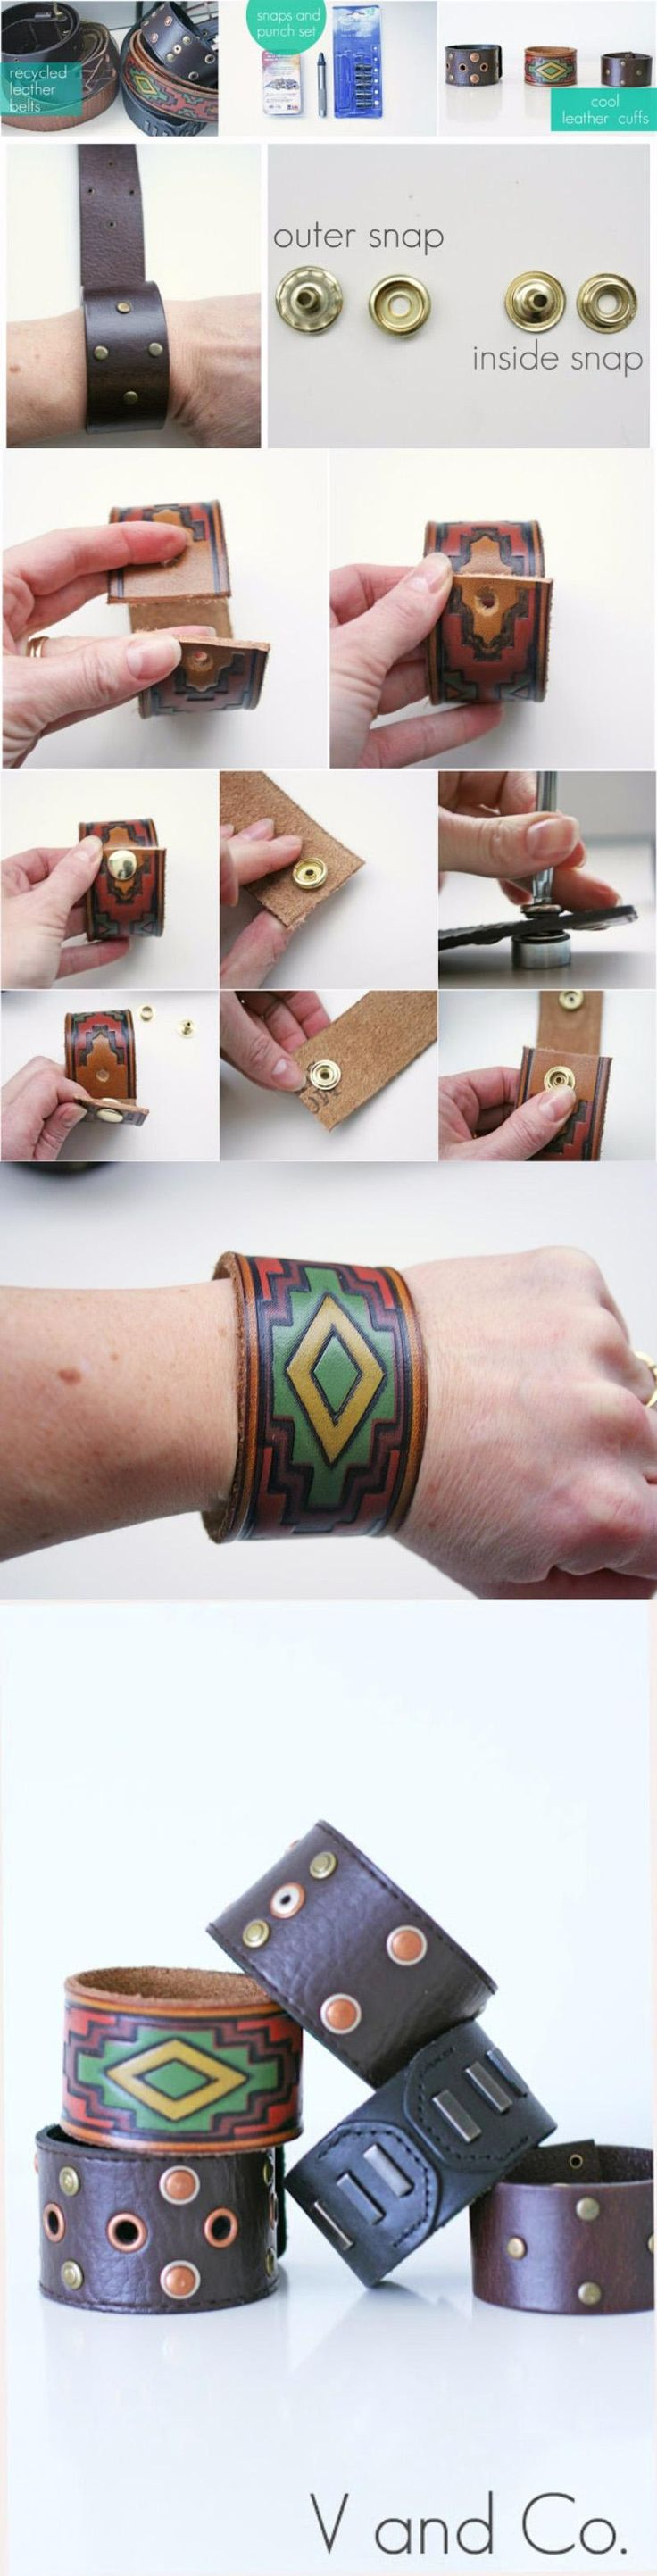 Brazaletes de cuero - vanessachristenson.com - DIY Bracelet From Recycled Leather Belts